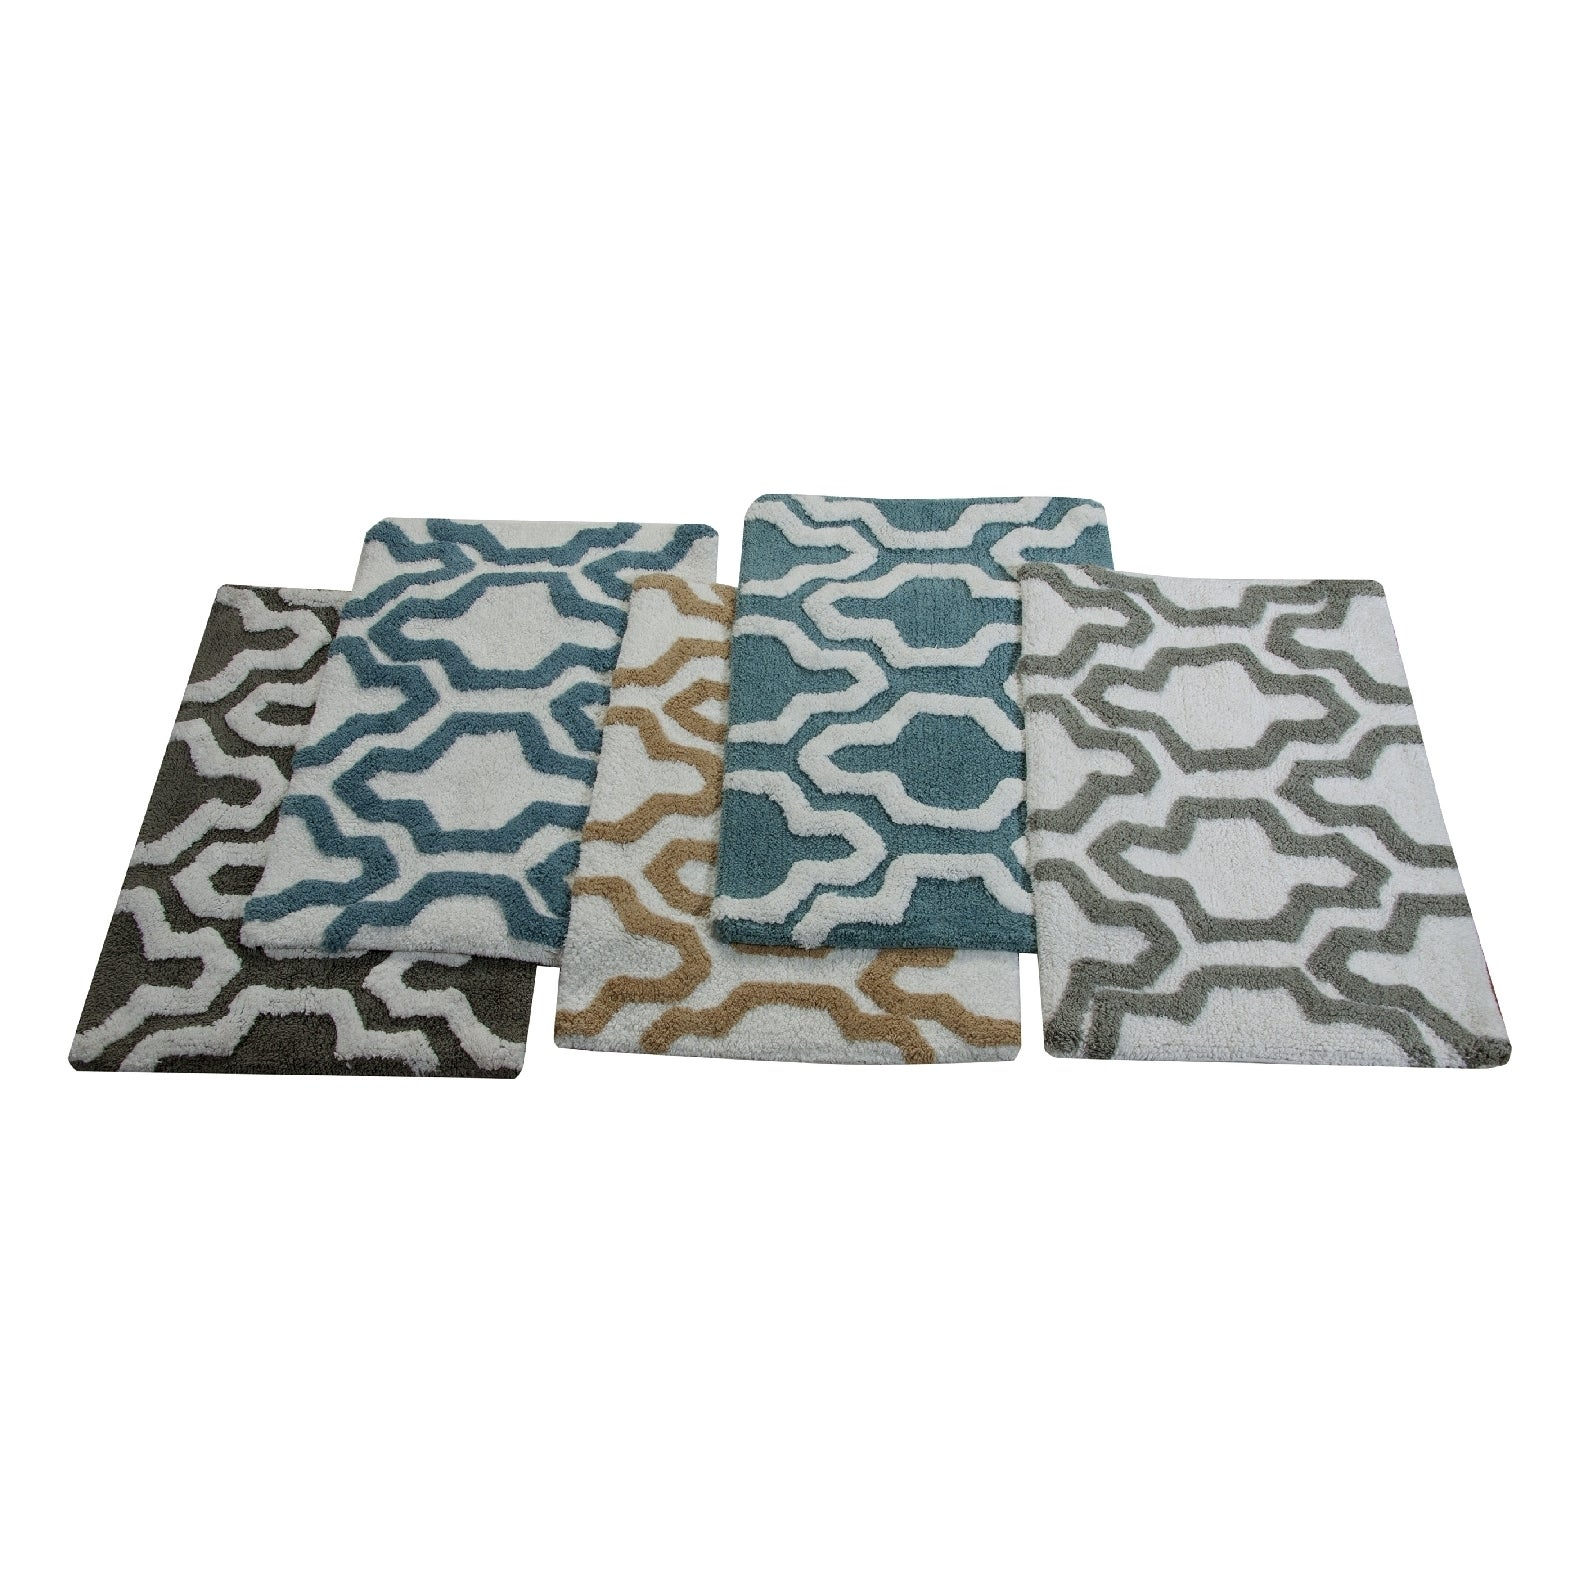 saffron fabs 2 piece 100 soft cotton bath rug set gray/white | ebay